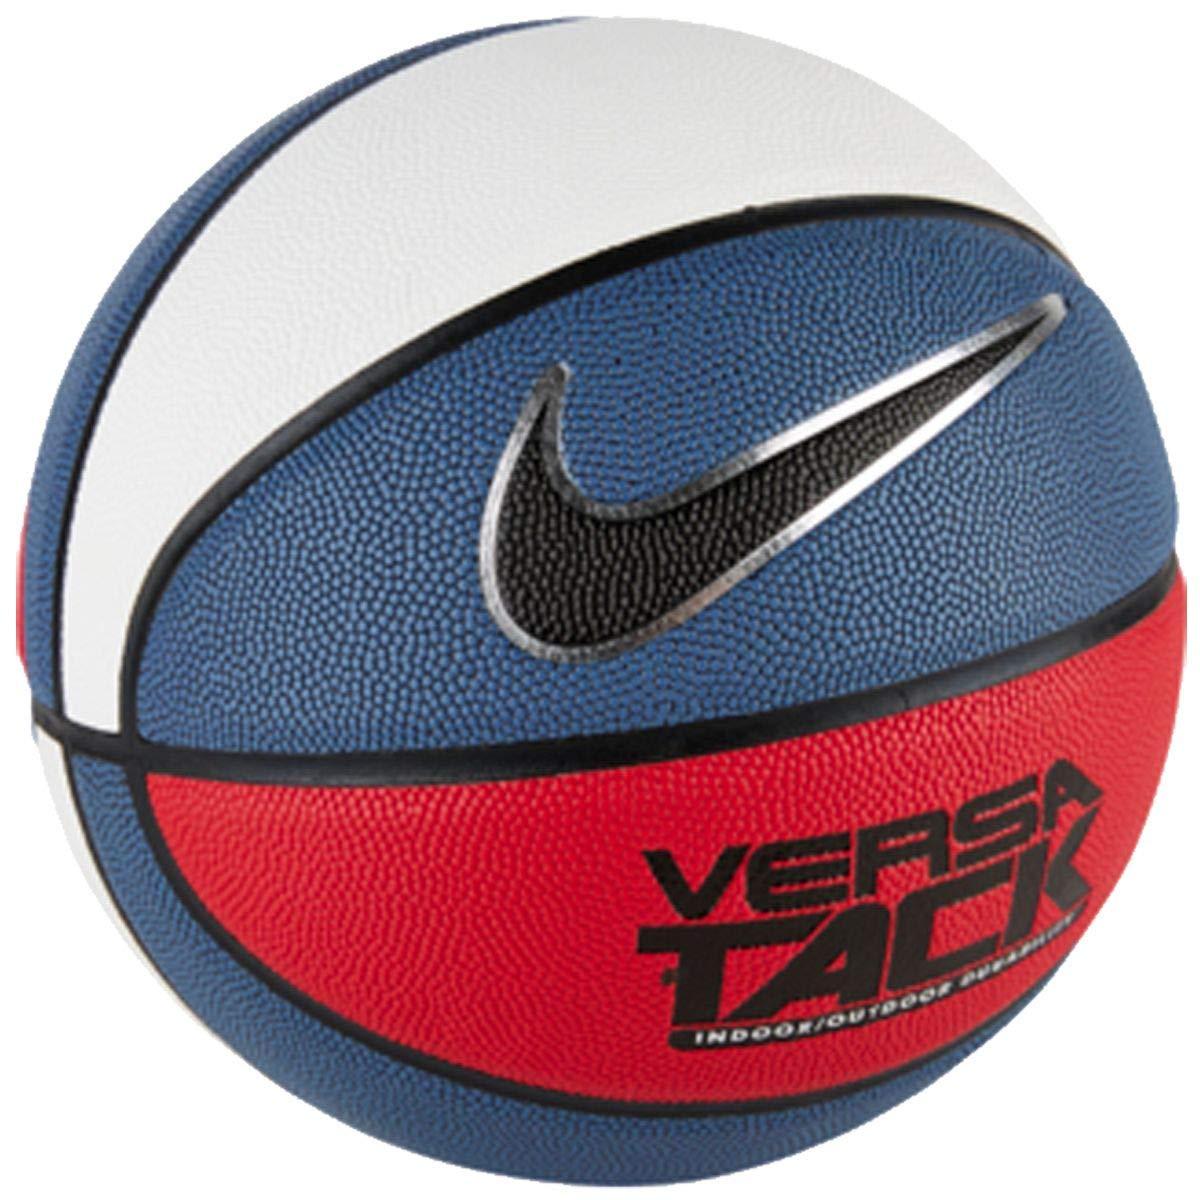 Nike Versa Tack 8p Pelota Unisex Adulto